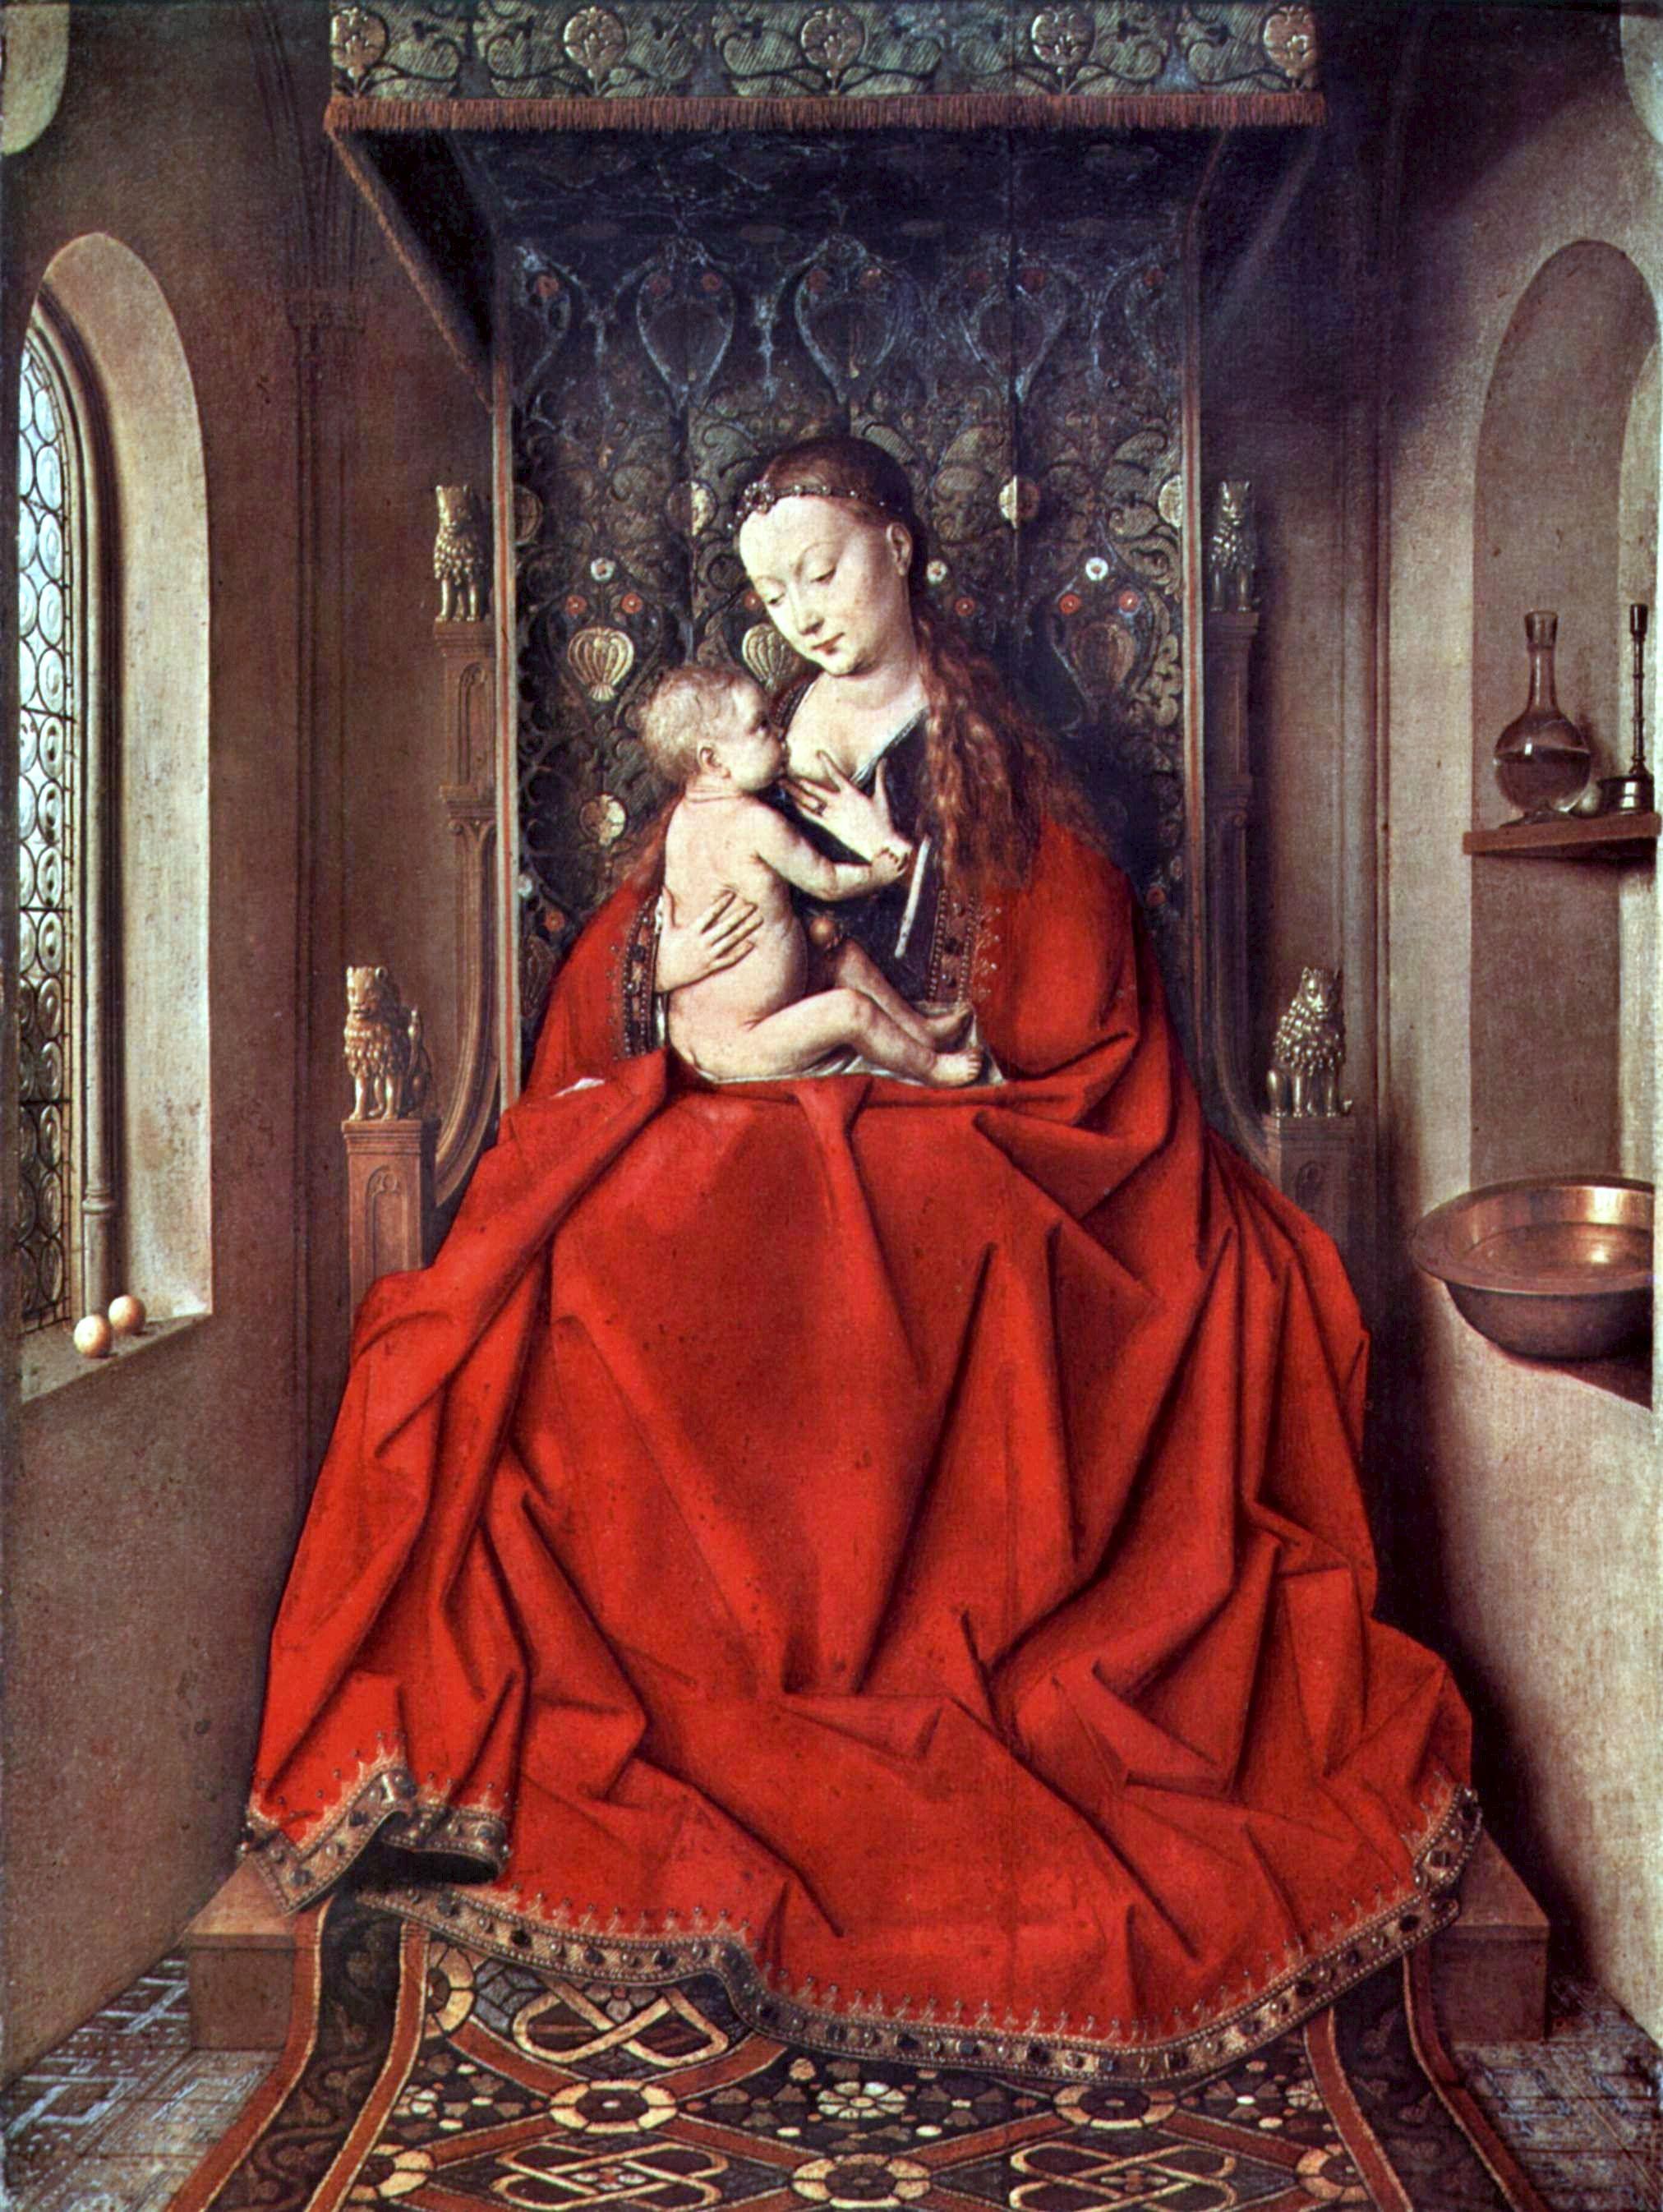 http://upload.wikimedia.org/wikipedia/commons/5/51/Jan_van_Eyck_076.jpg